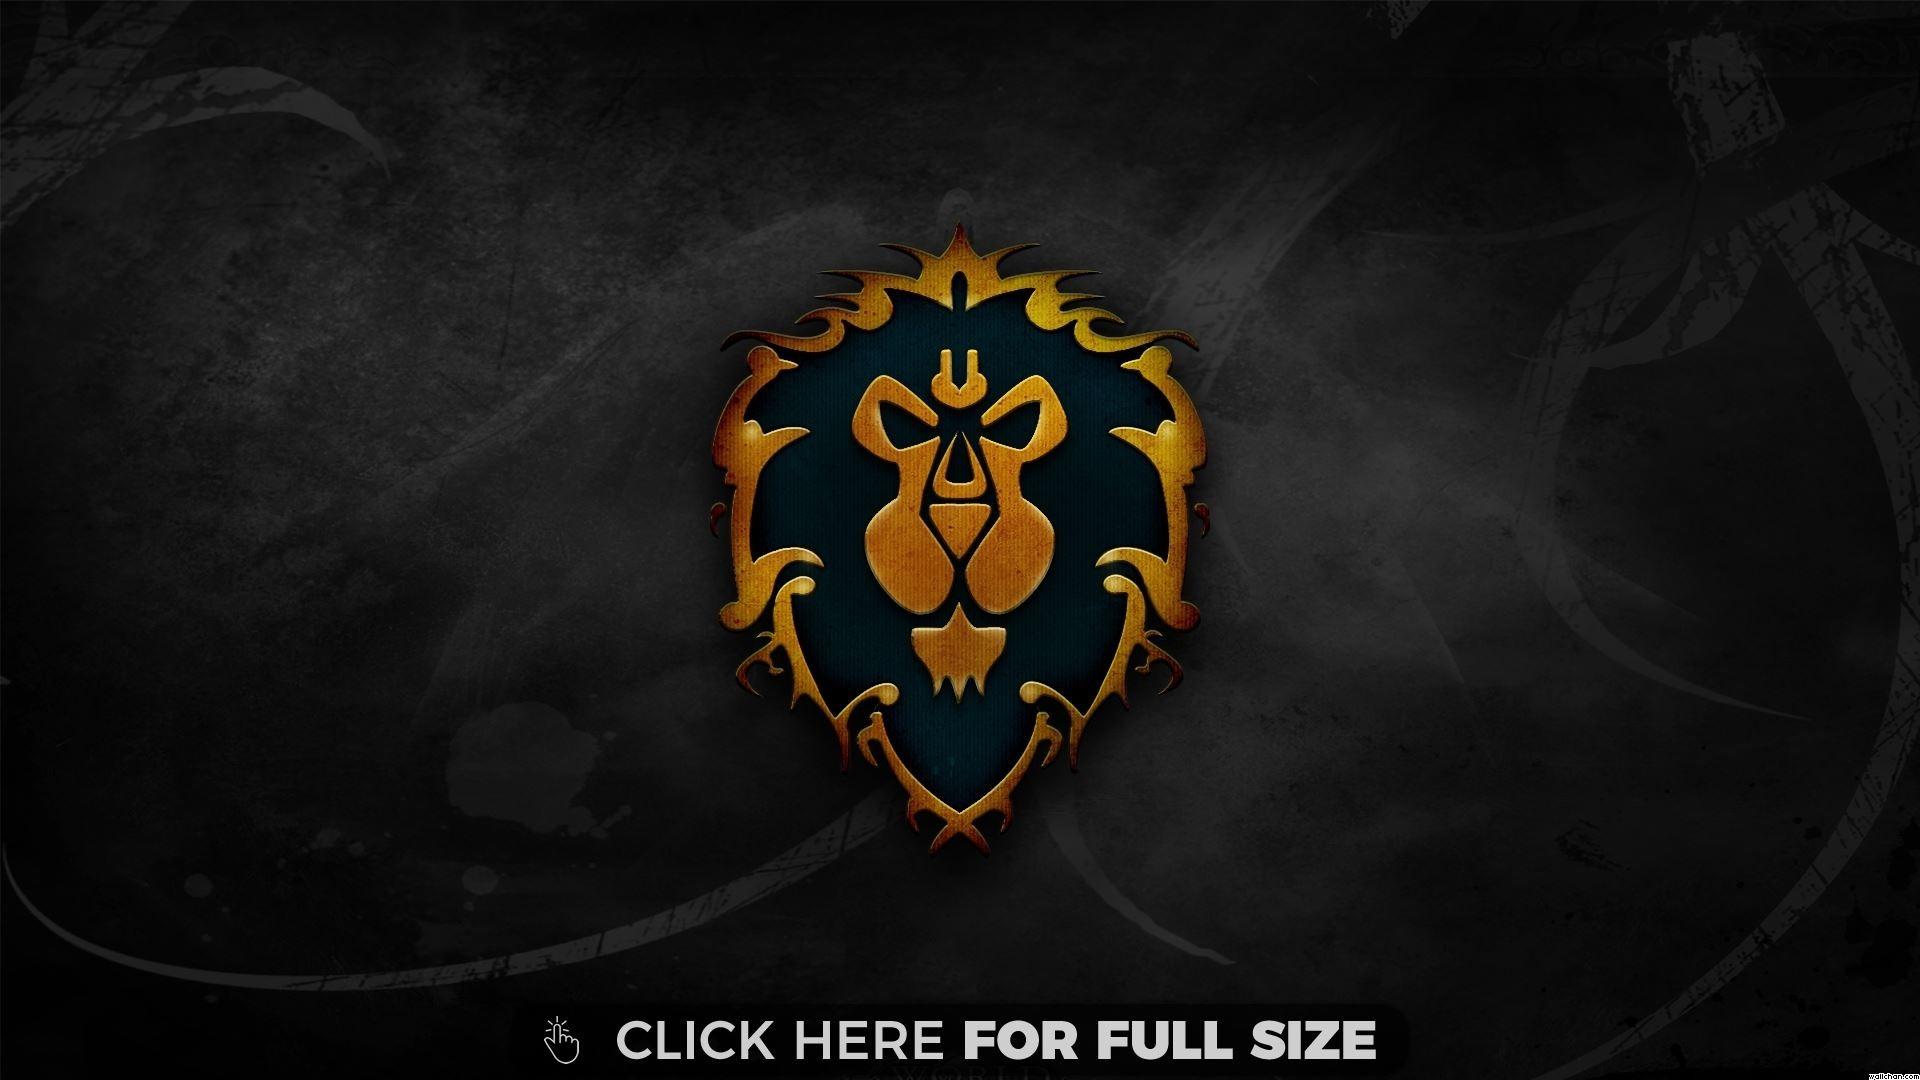 World Of Warcraft 8119 wallpaper